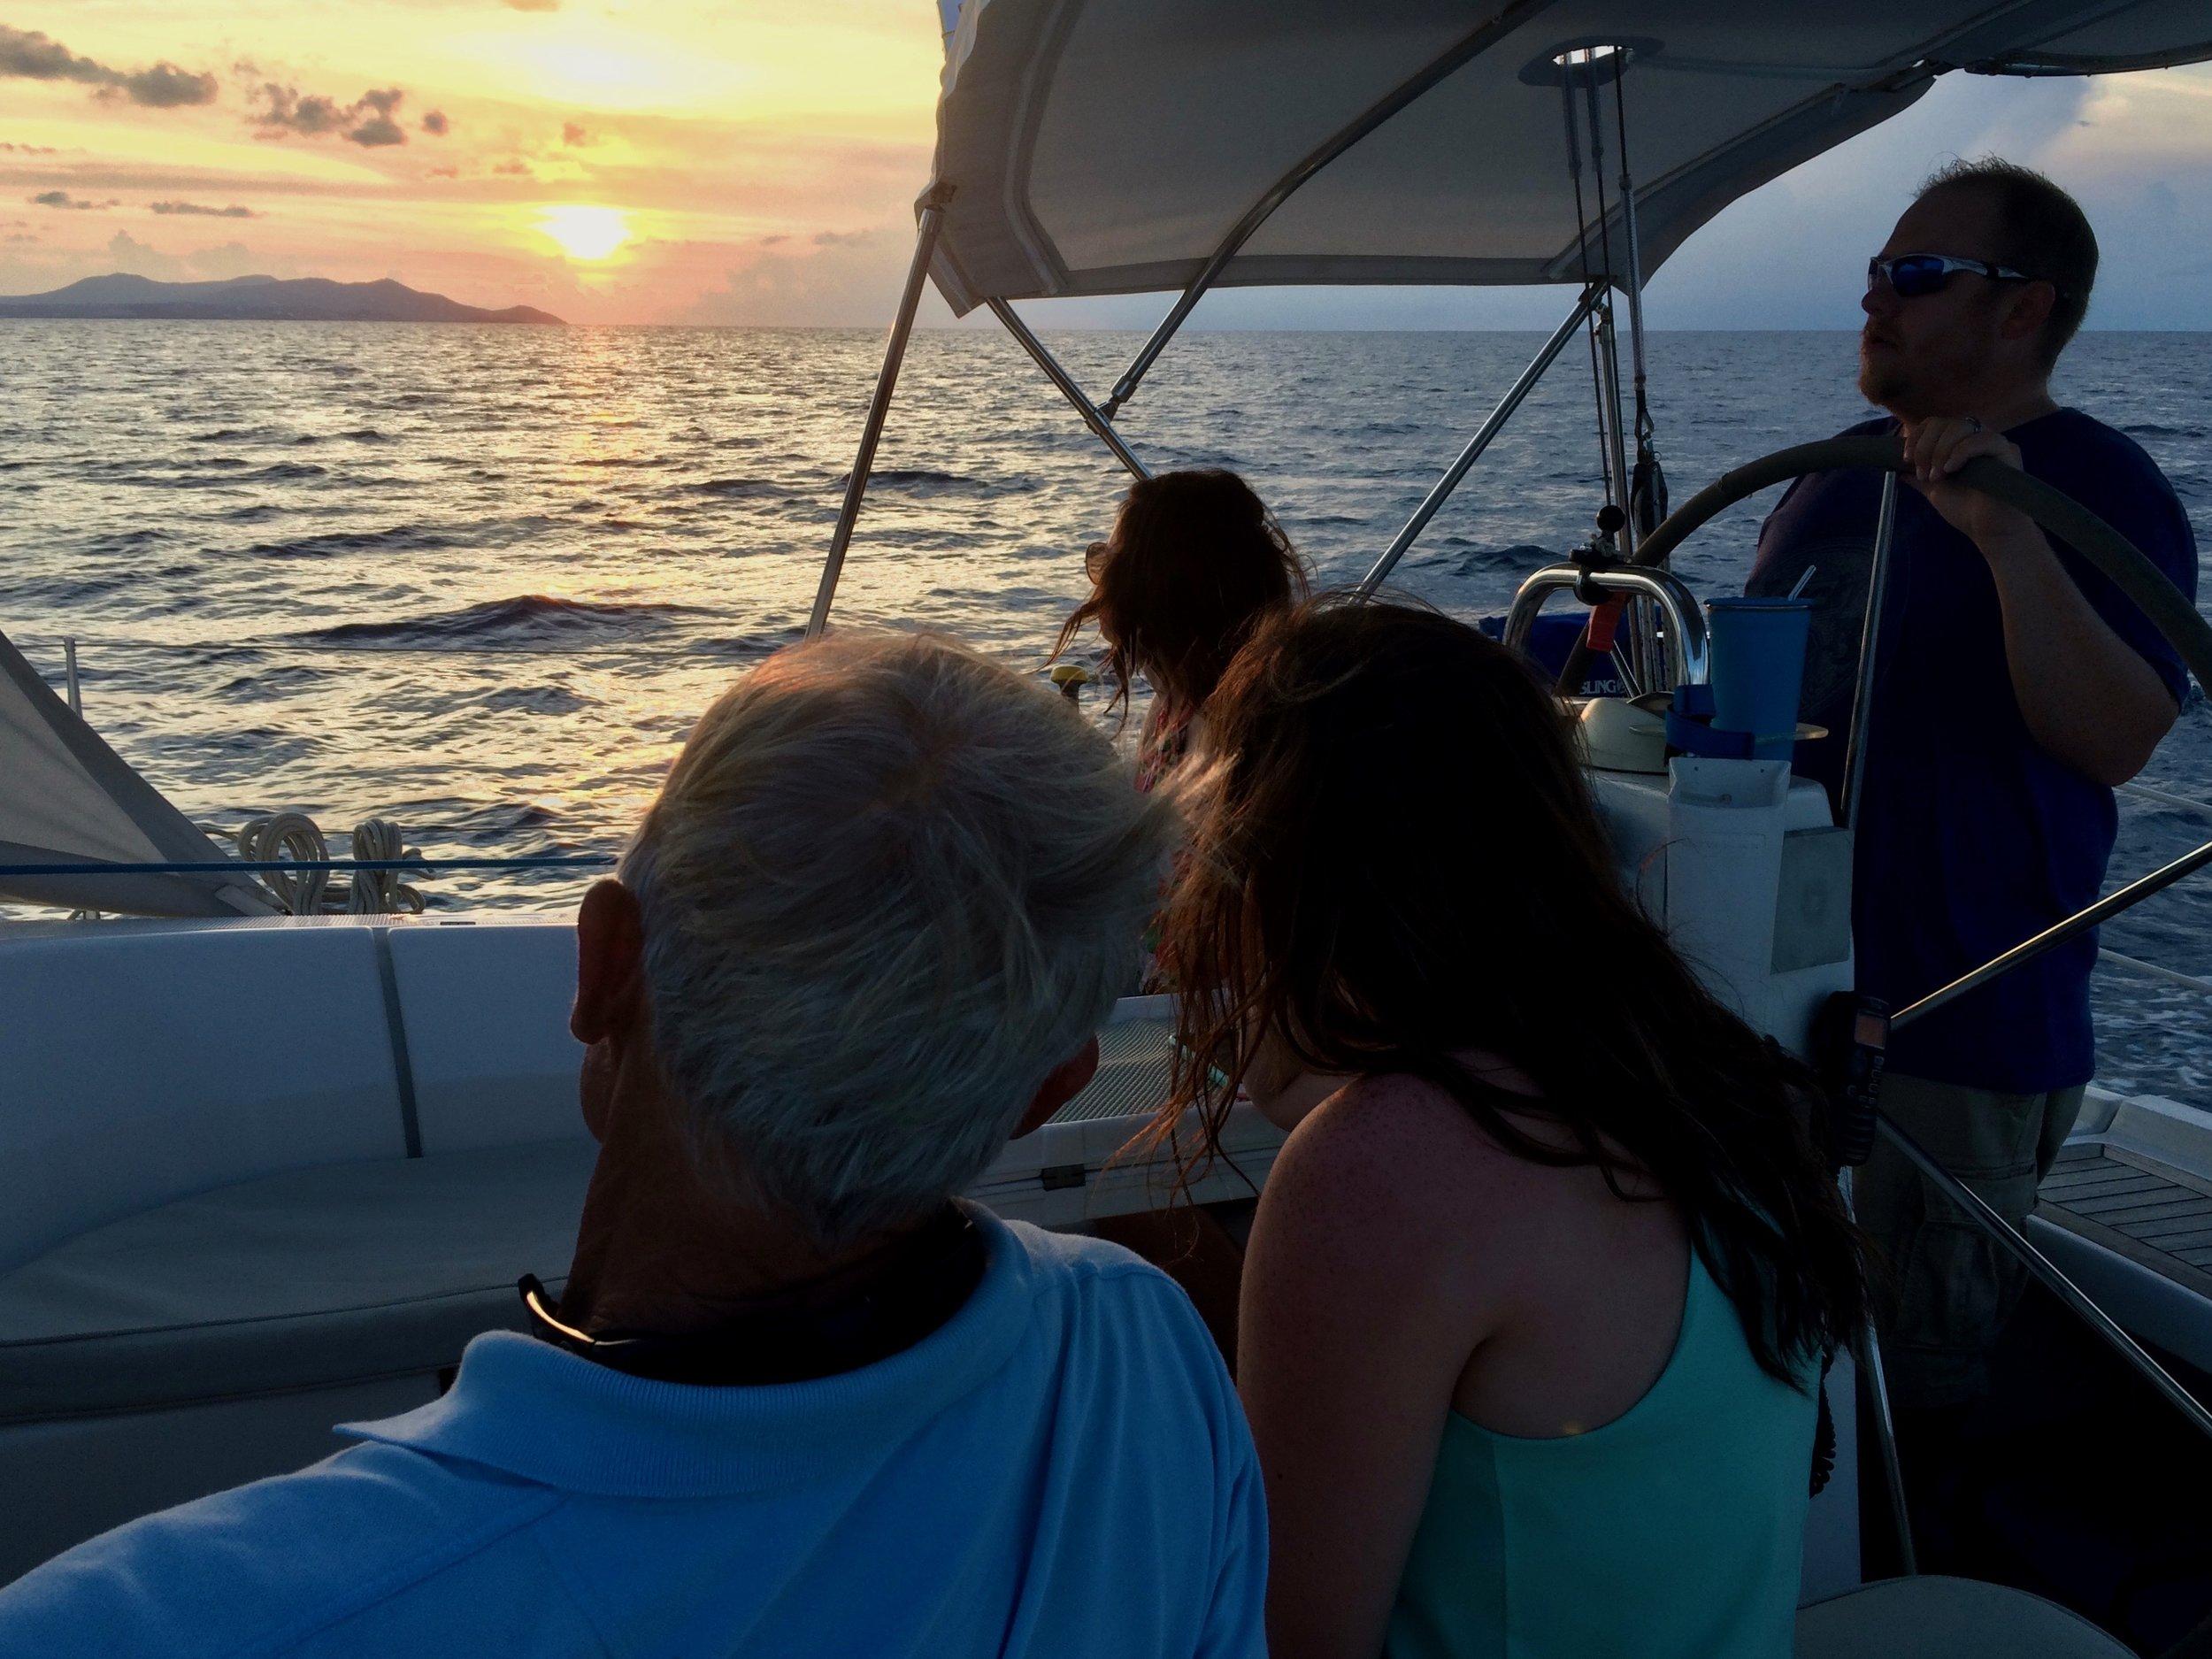 Lightheart Sunset Sail